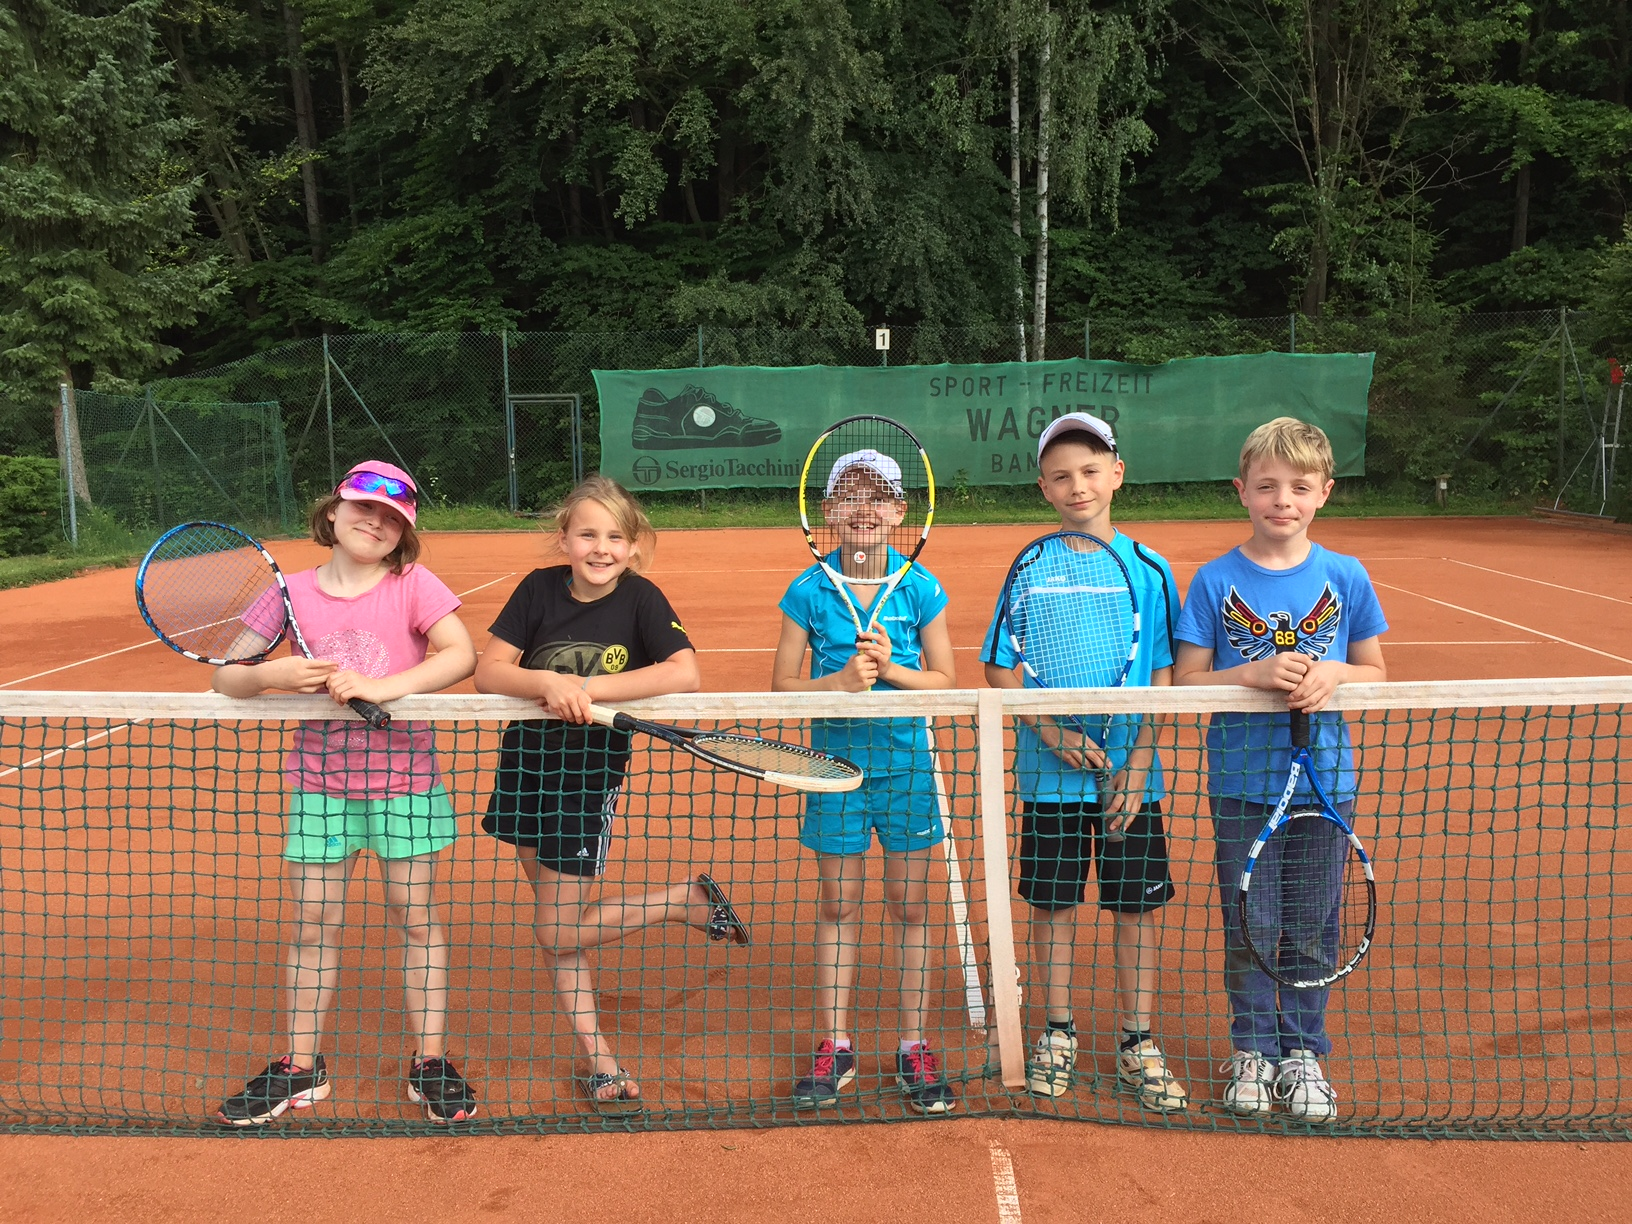 v.l. Marie, Maxi, Elina, Matthias, Leandro